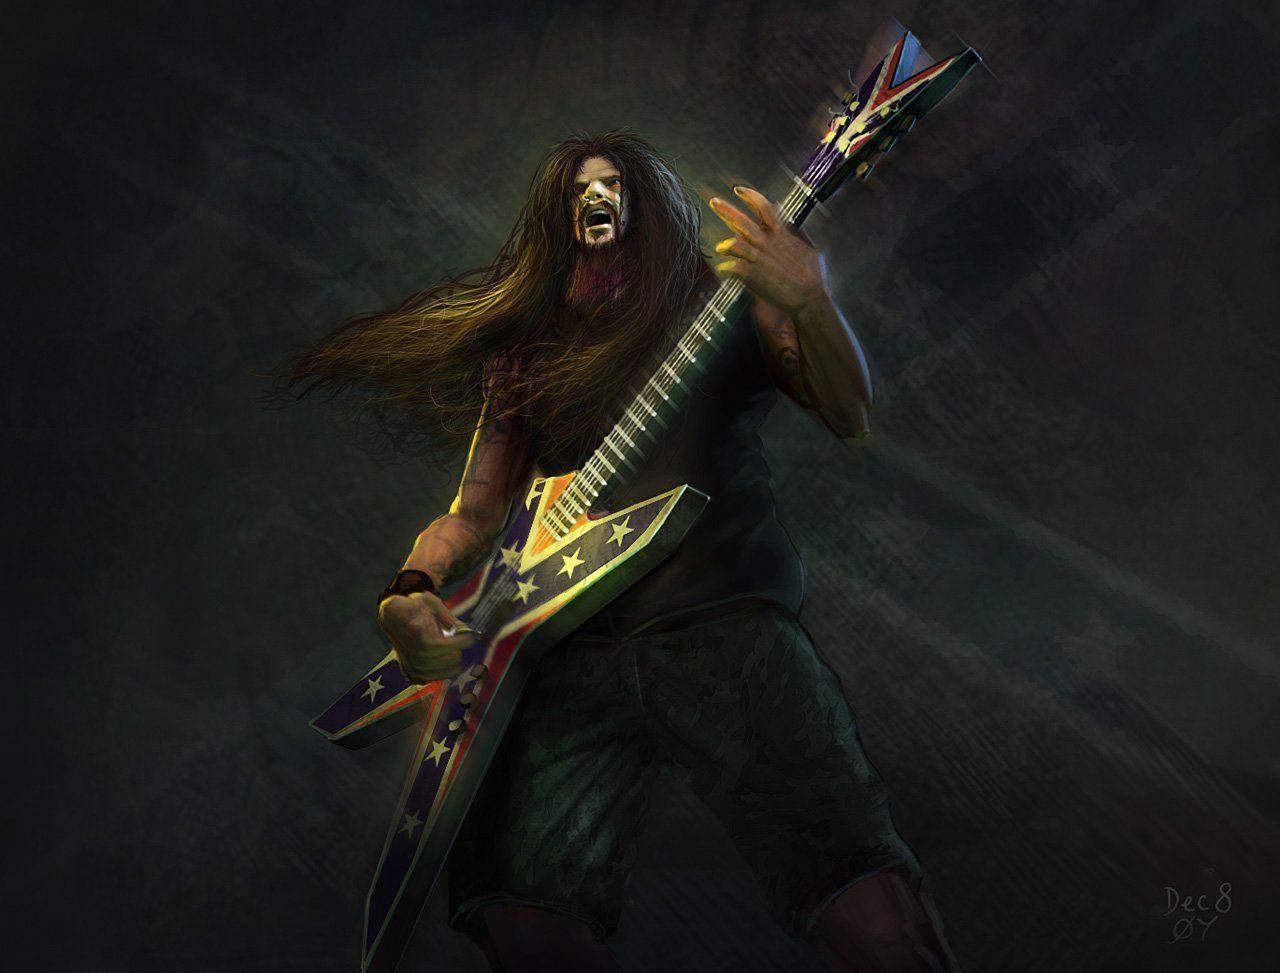 Metal music background - Heavy Metal Music Wallpaper 57207_music_music_ _heavy_metal_wallpaper Jpg